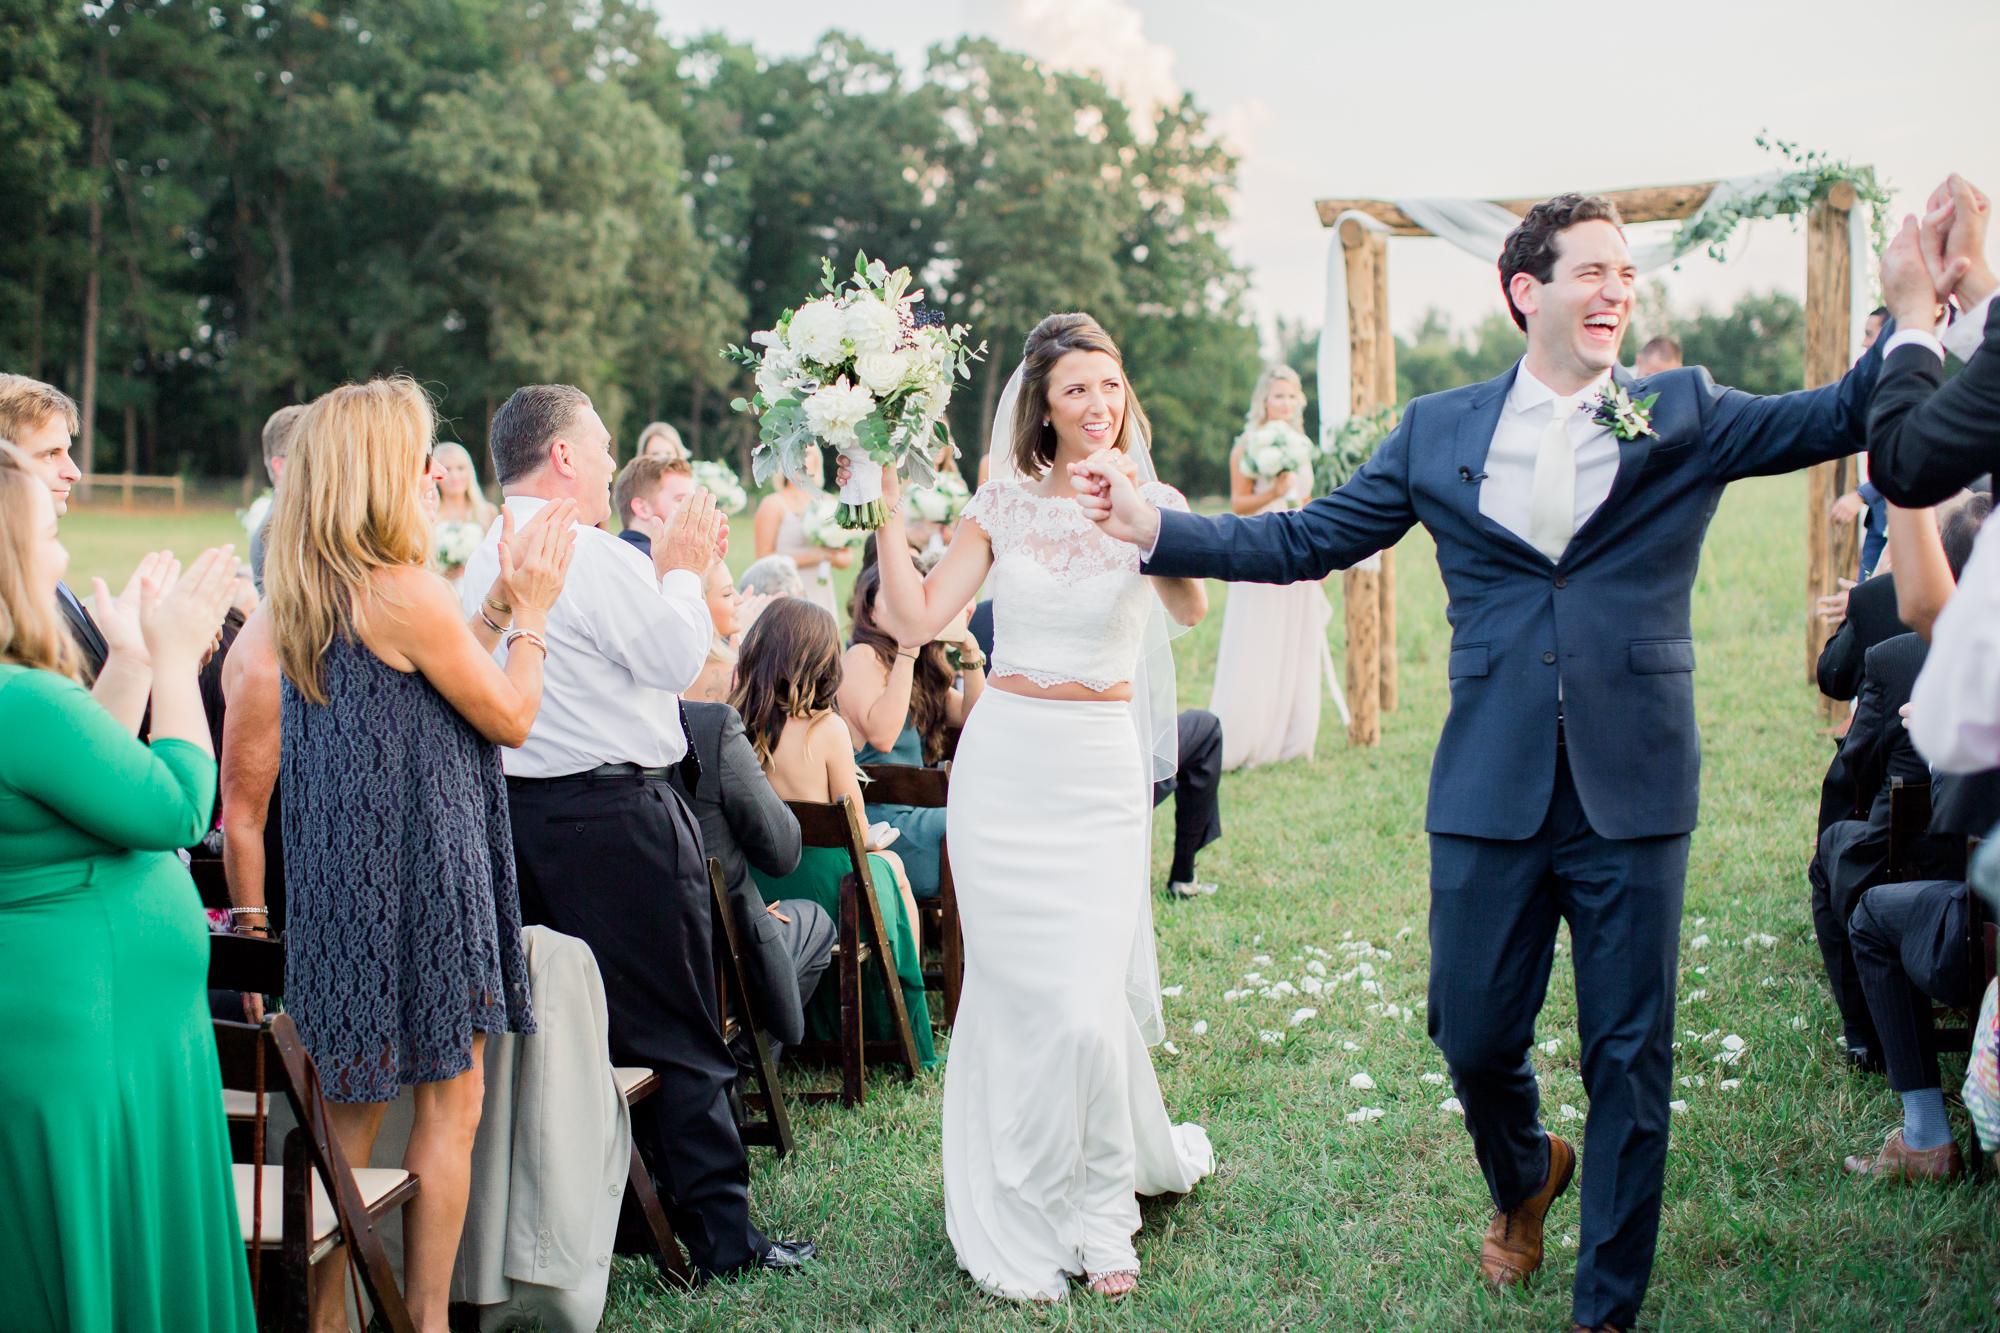 wedding ceremony exit idea